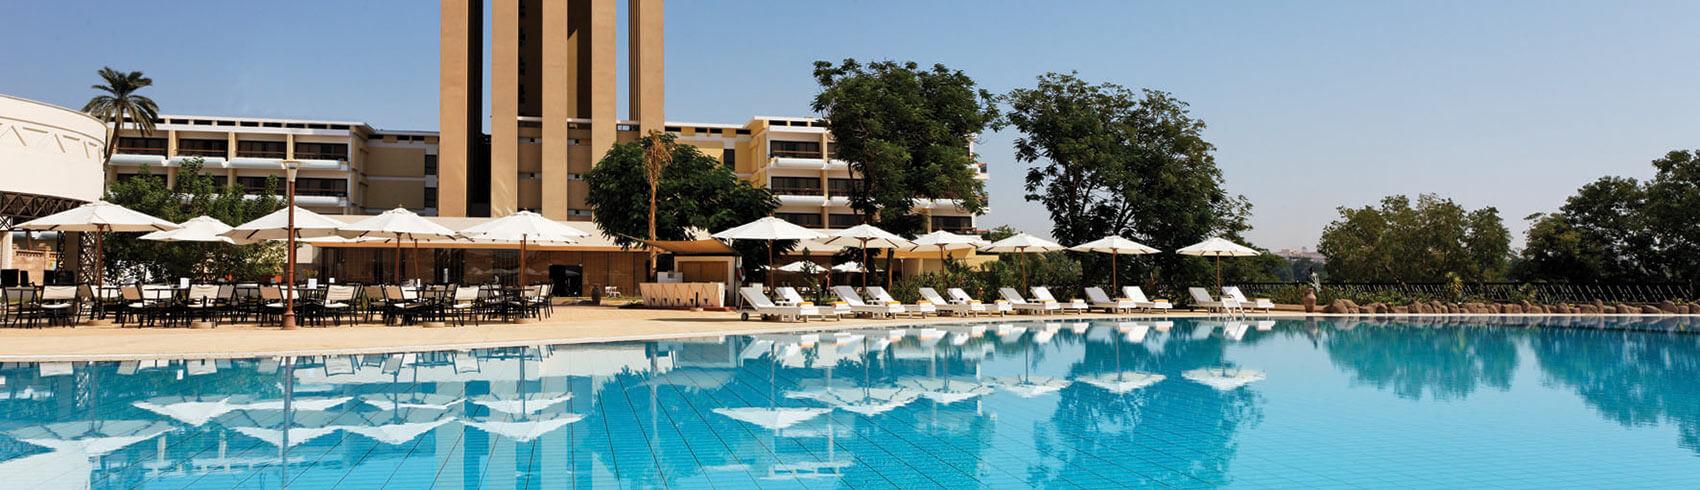 Movenpick Aswan Pool